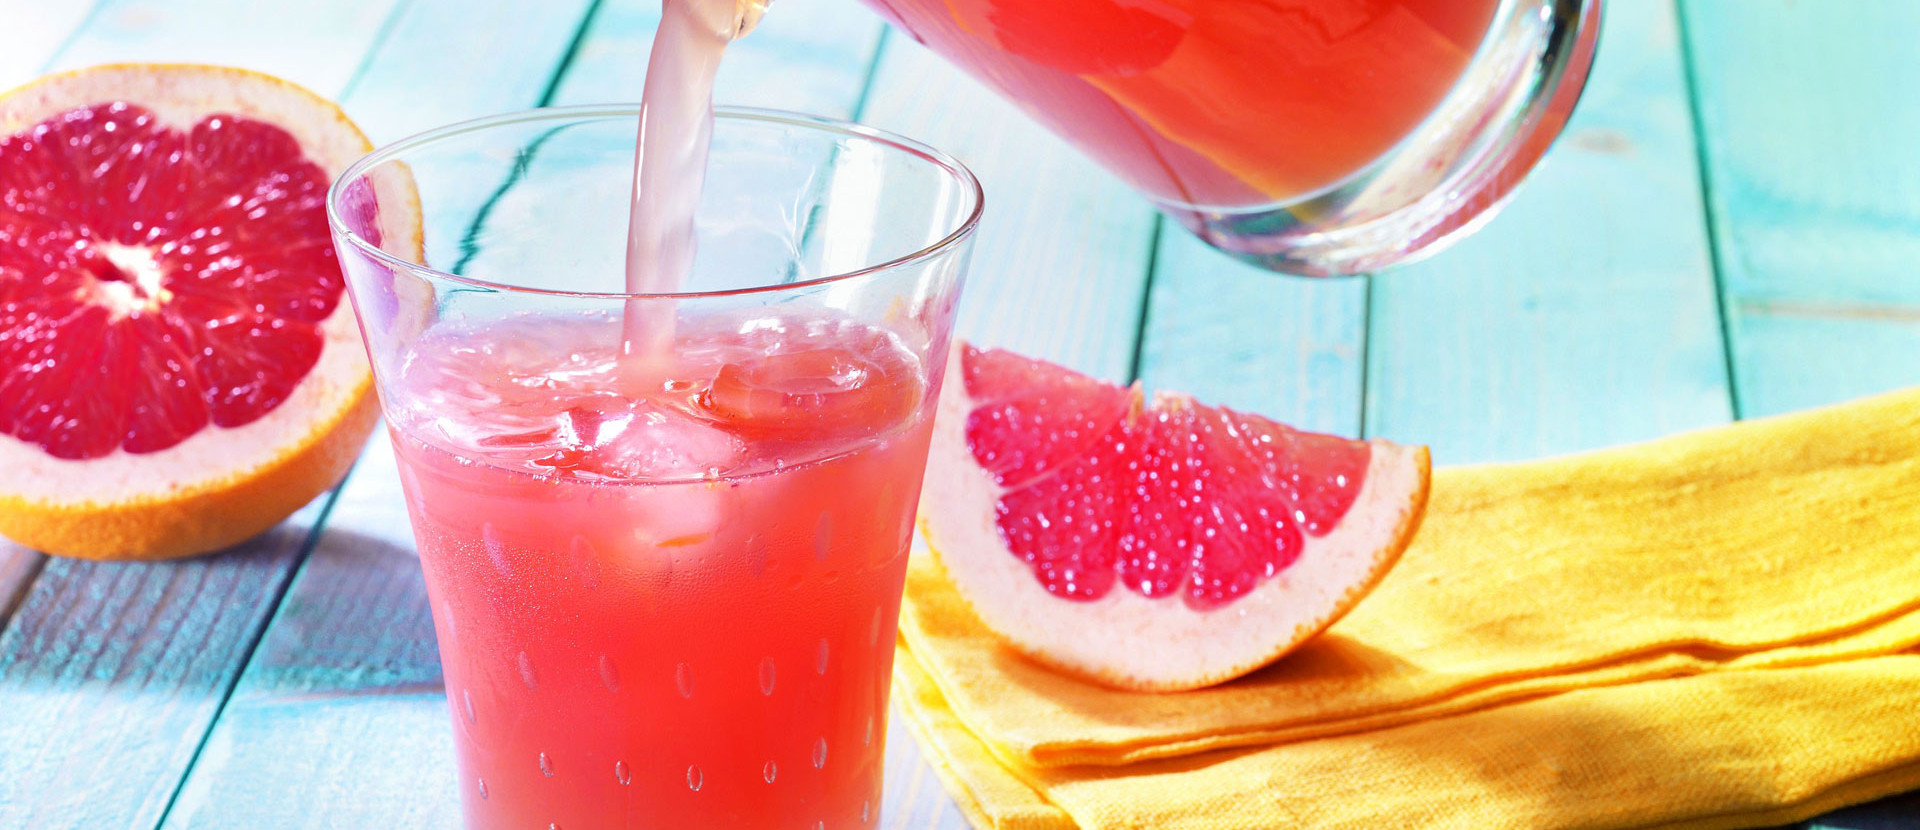 Pink Grapefruit Limonade